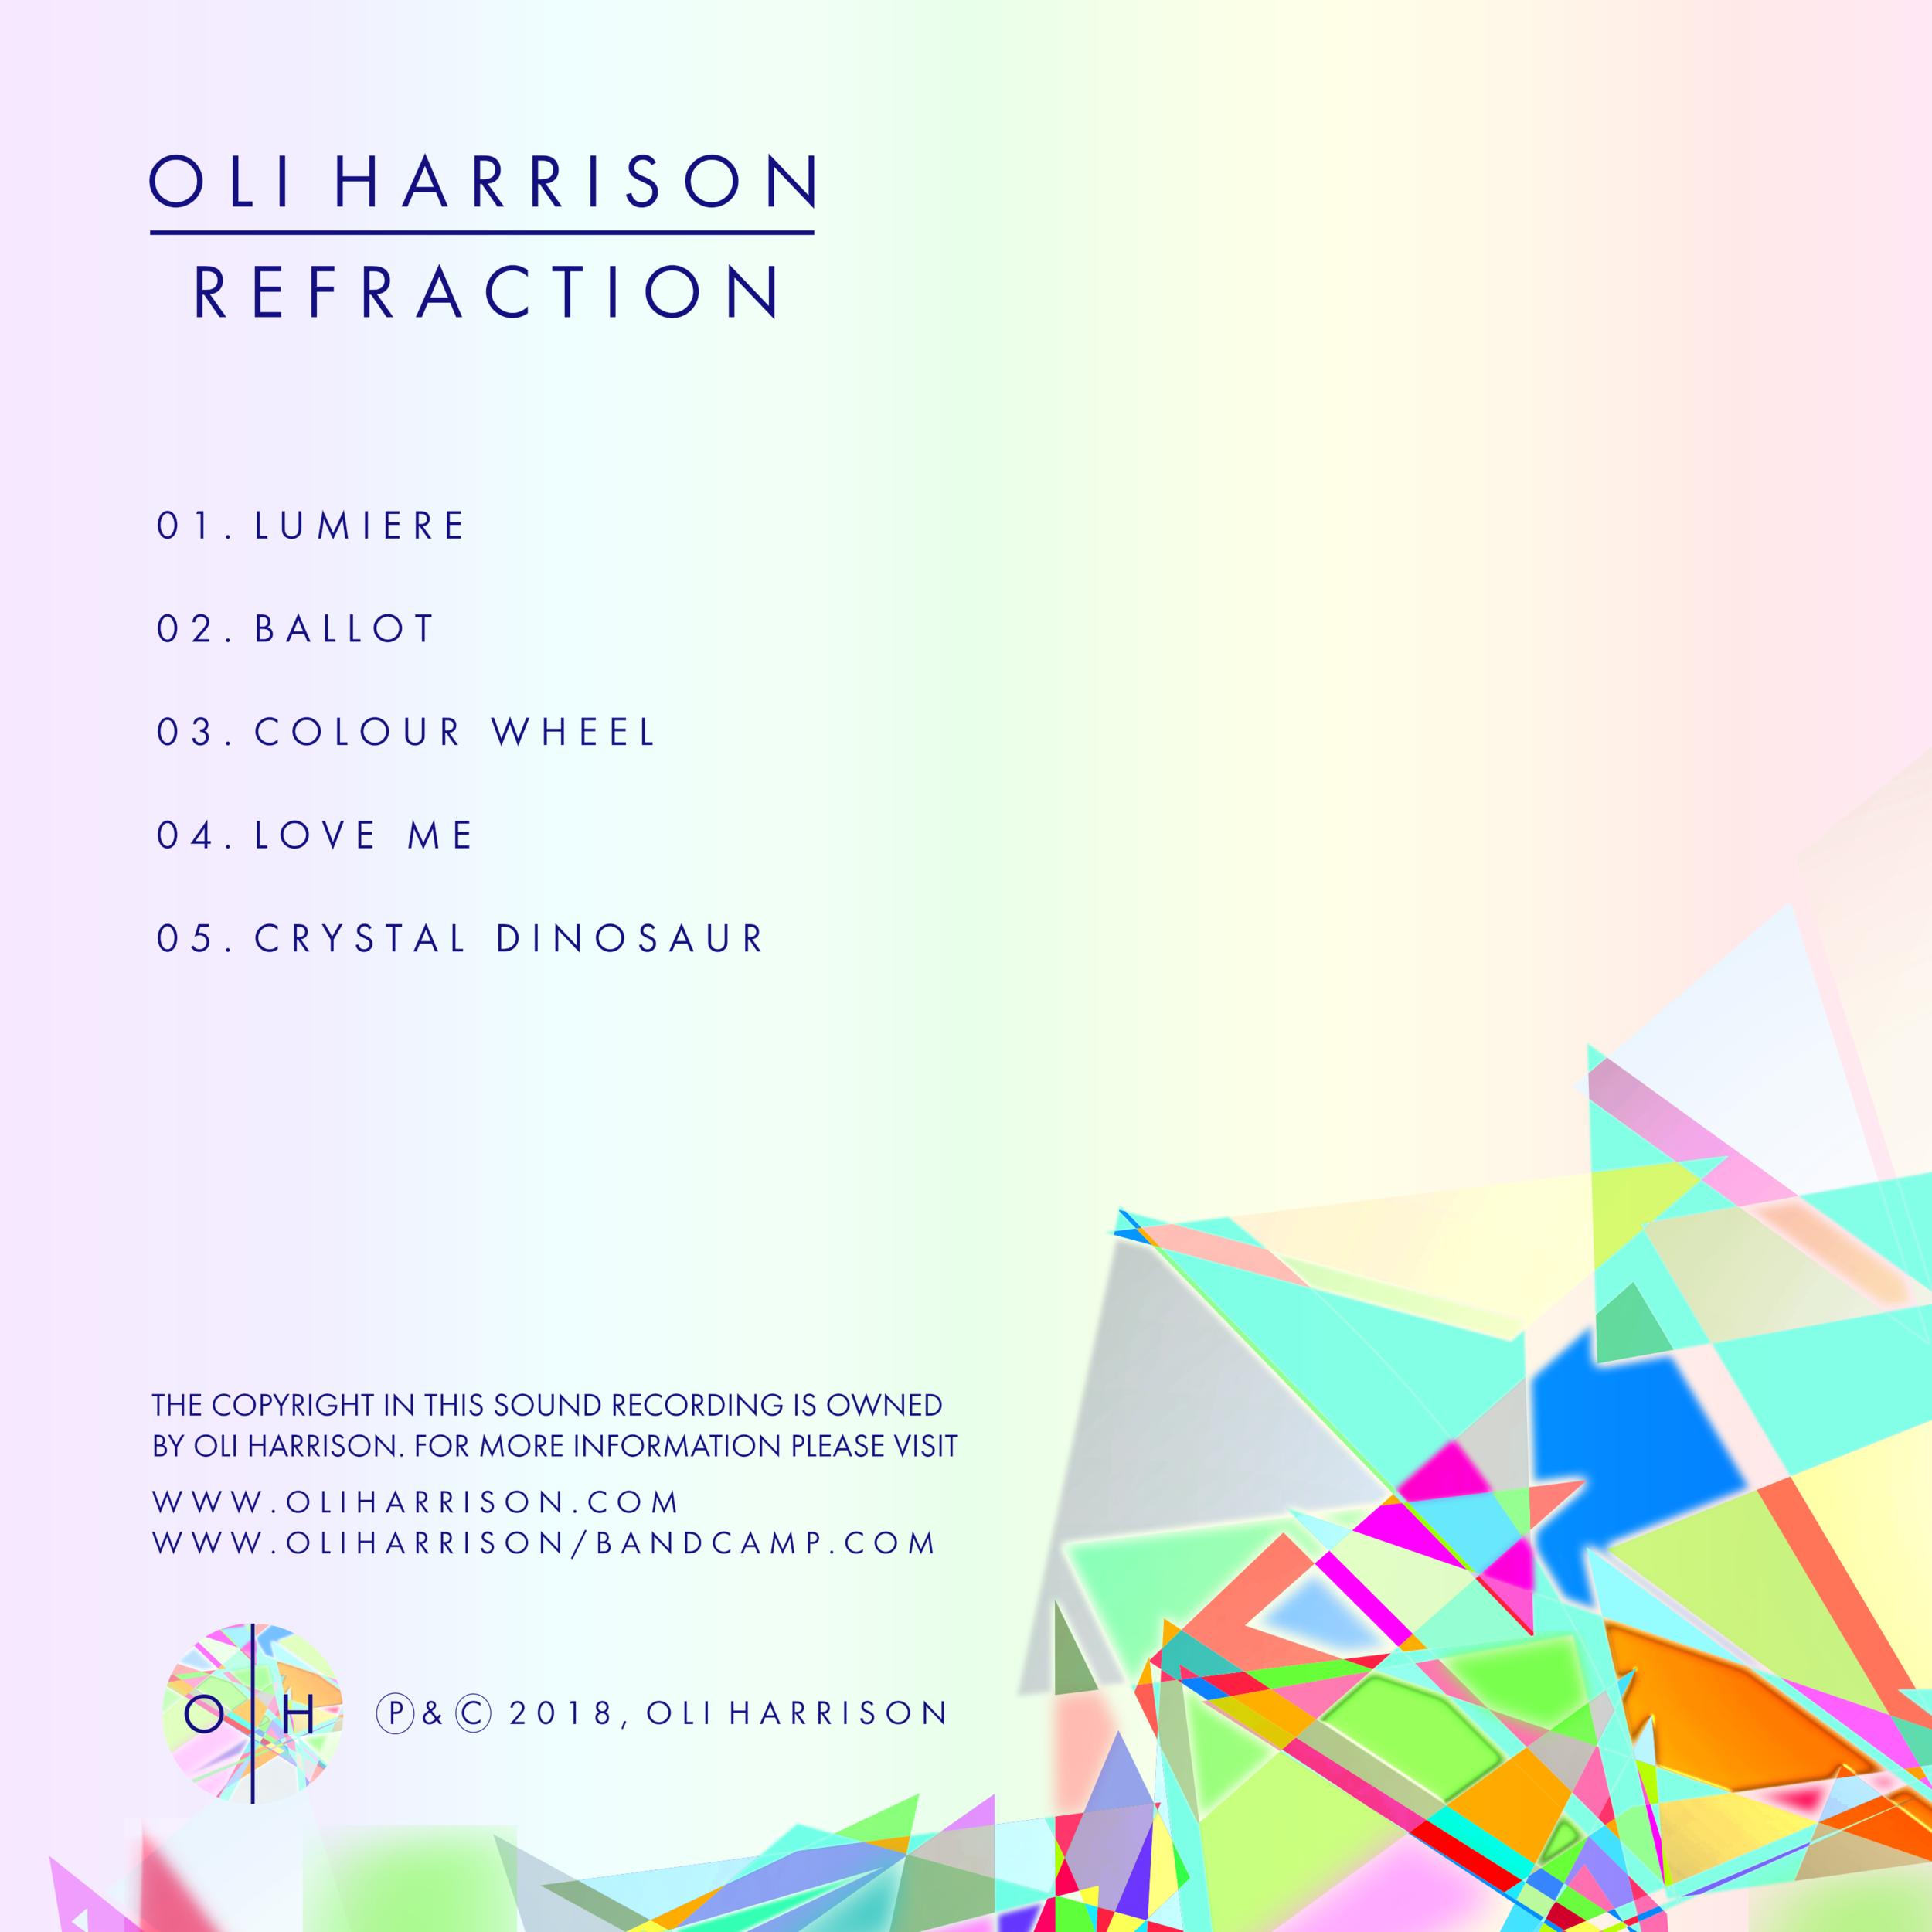 Refraction EP by Oli Harrison - Tracklist.